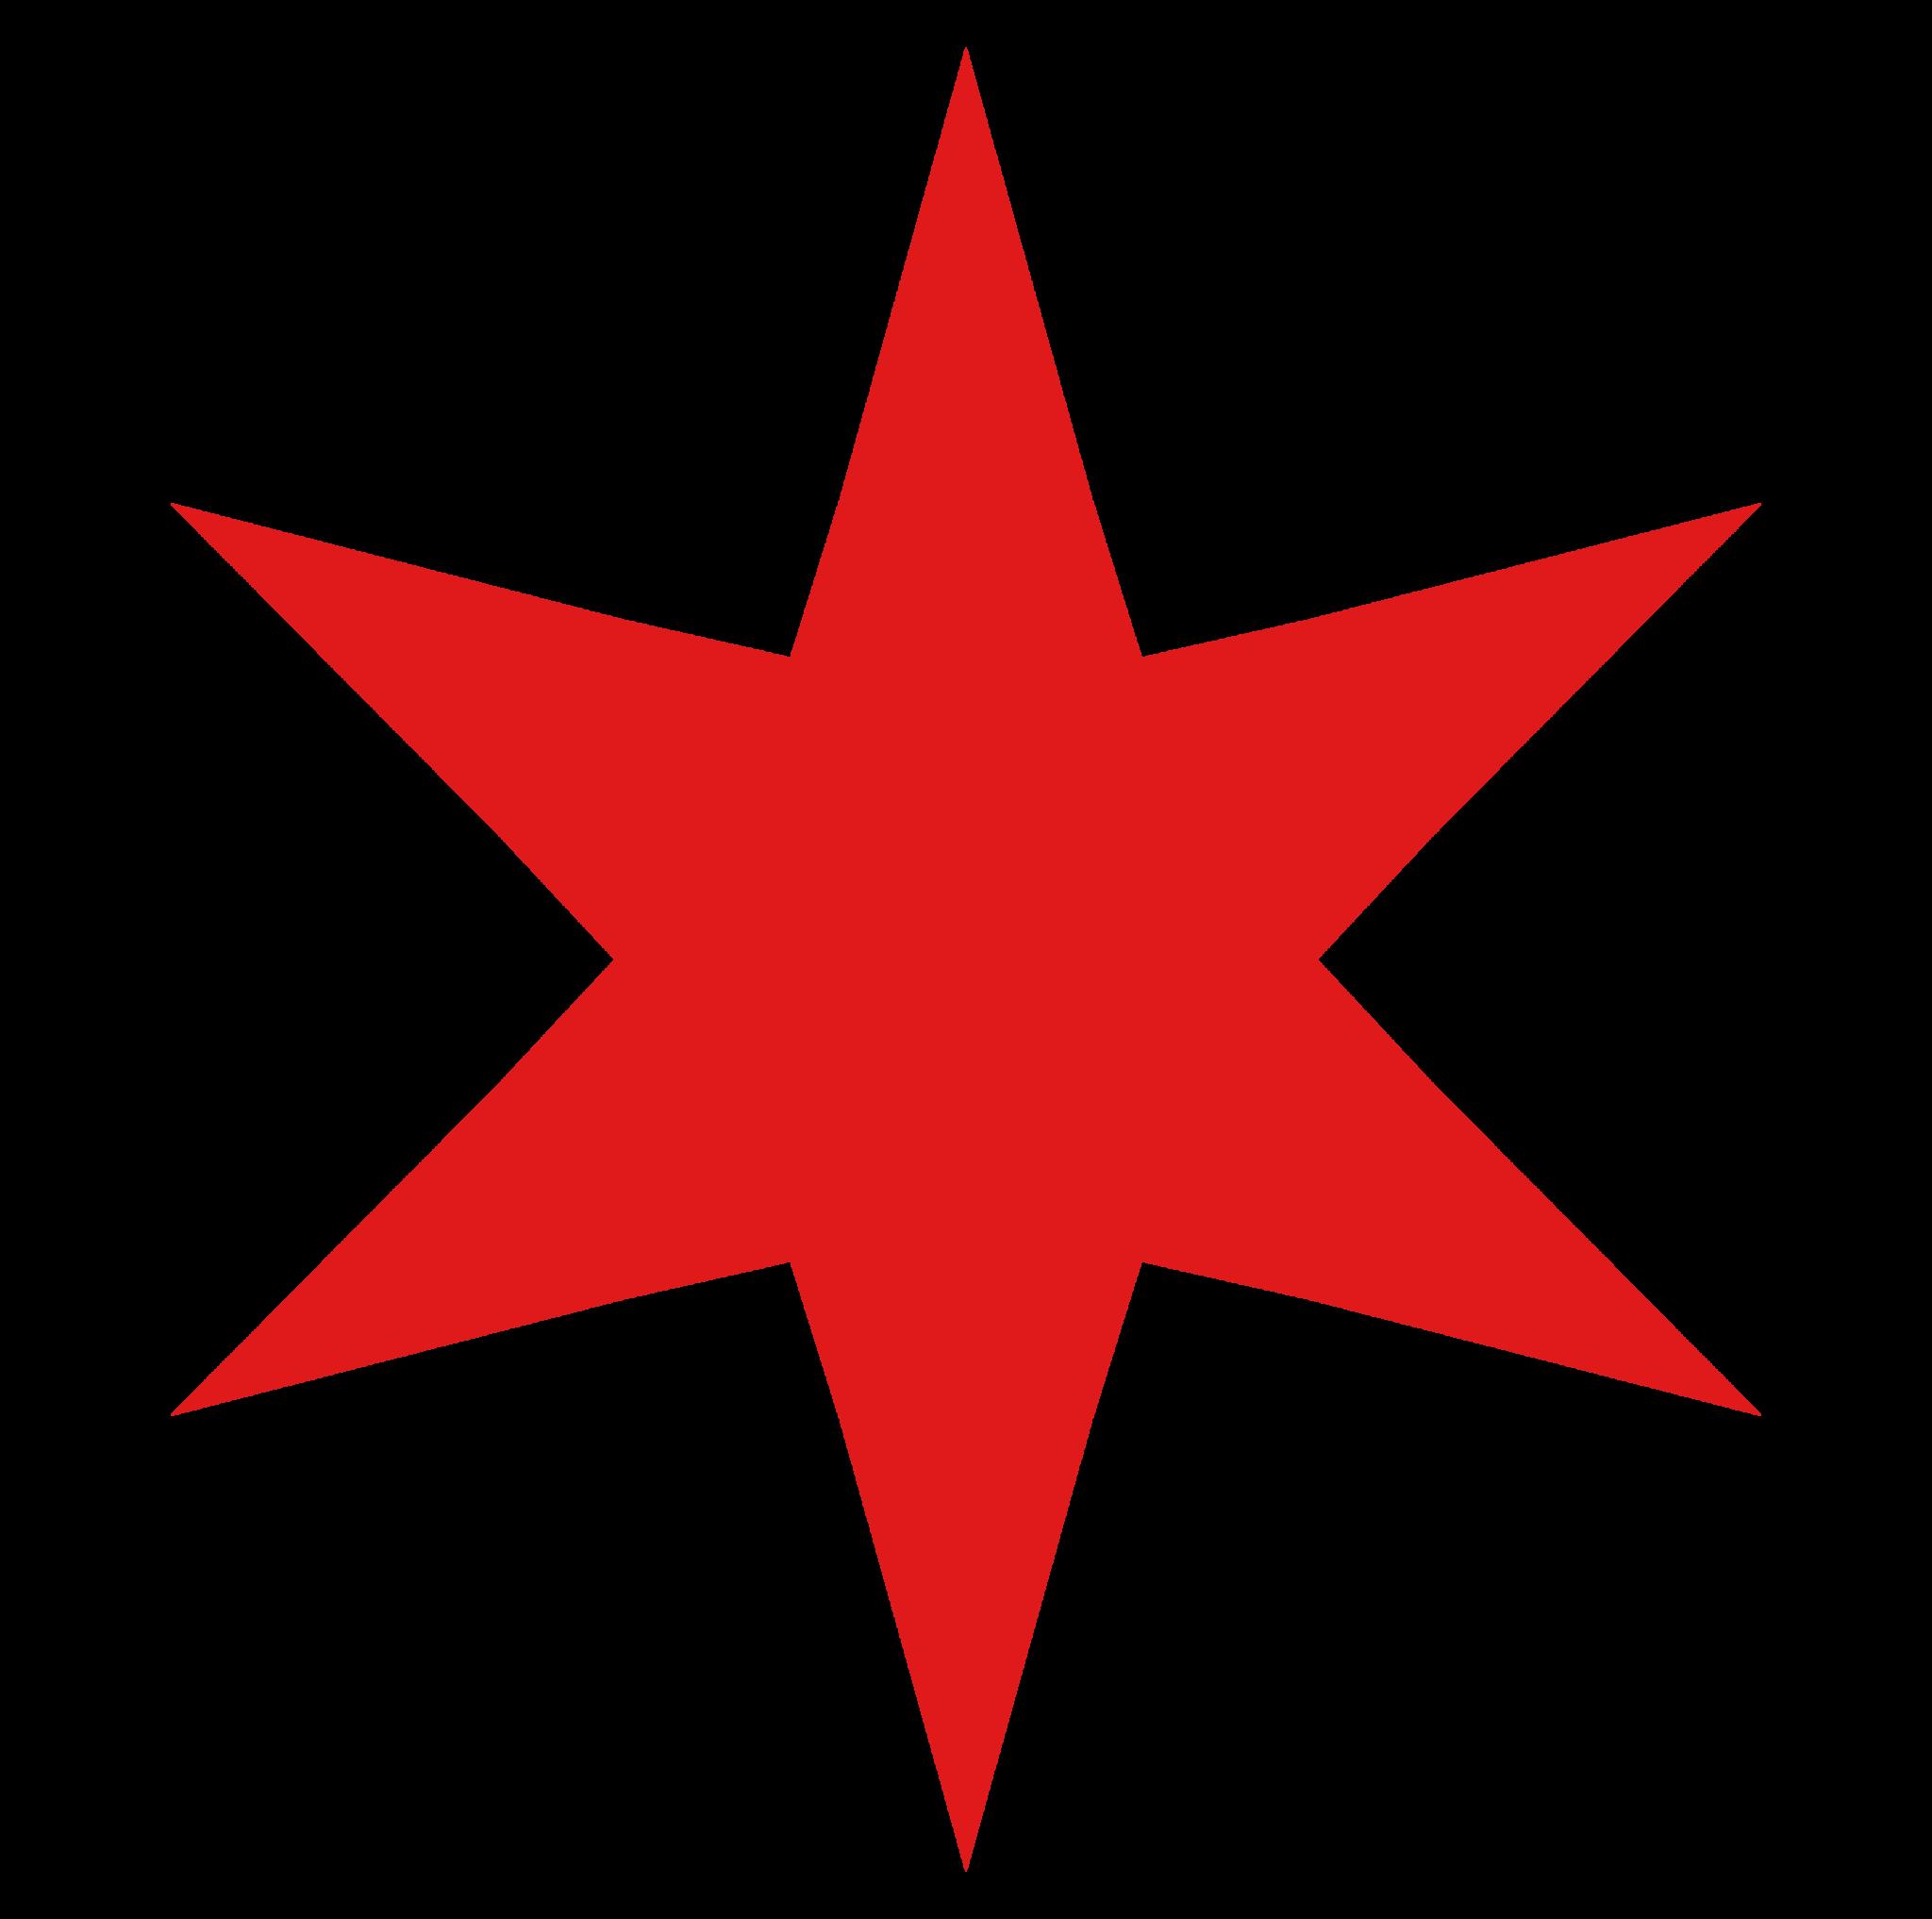 free star